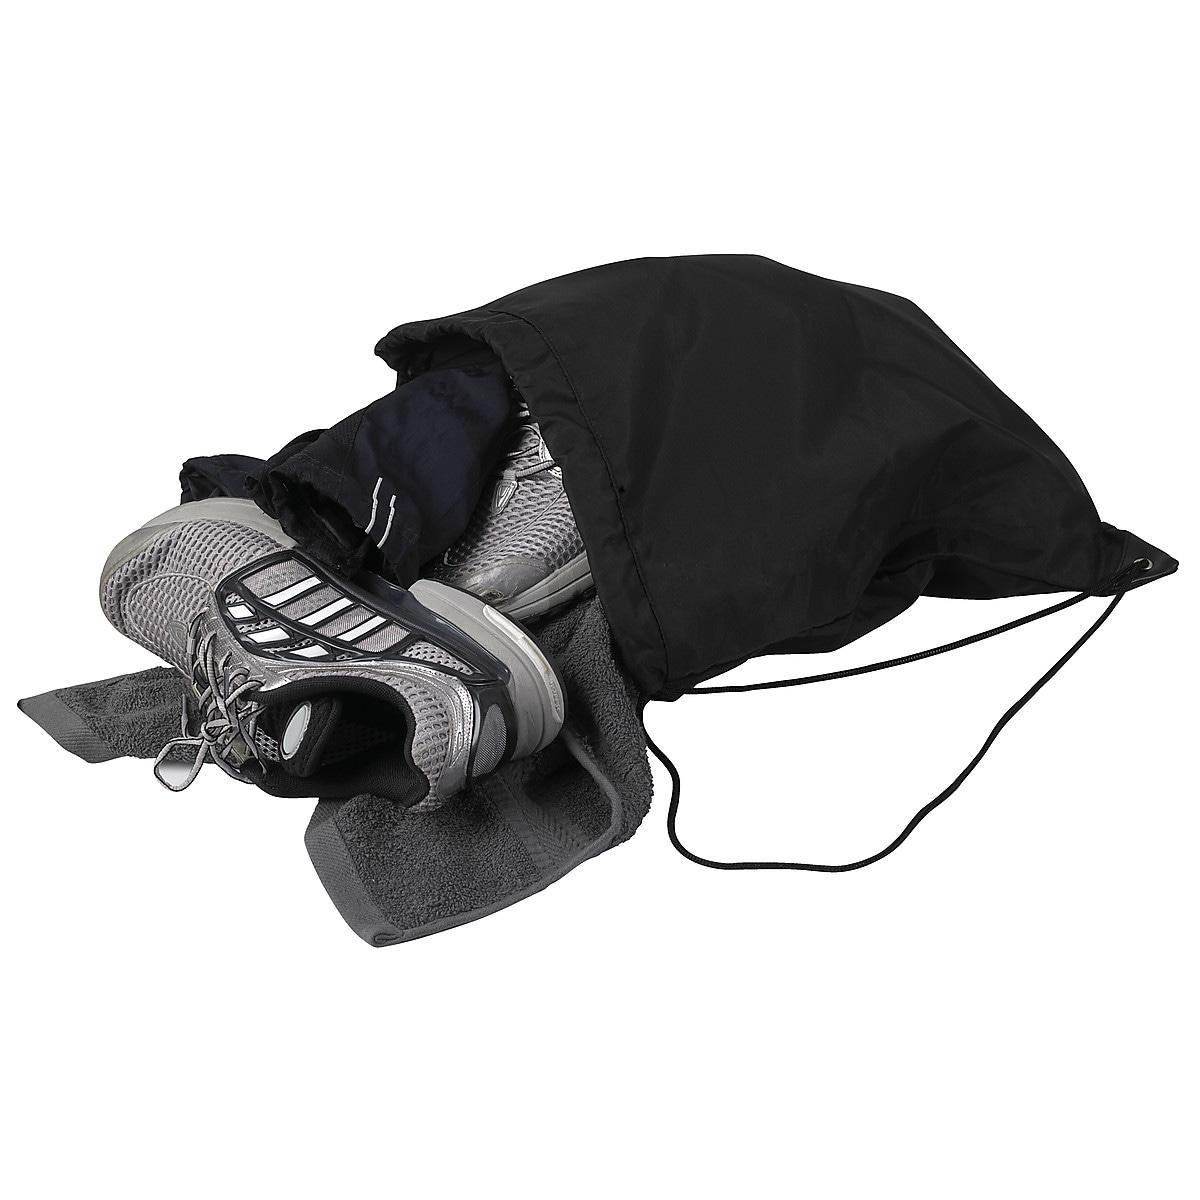 Asaklitt Laundry Bag